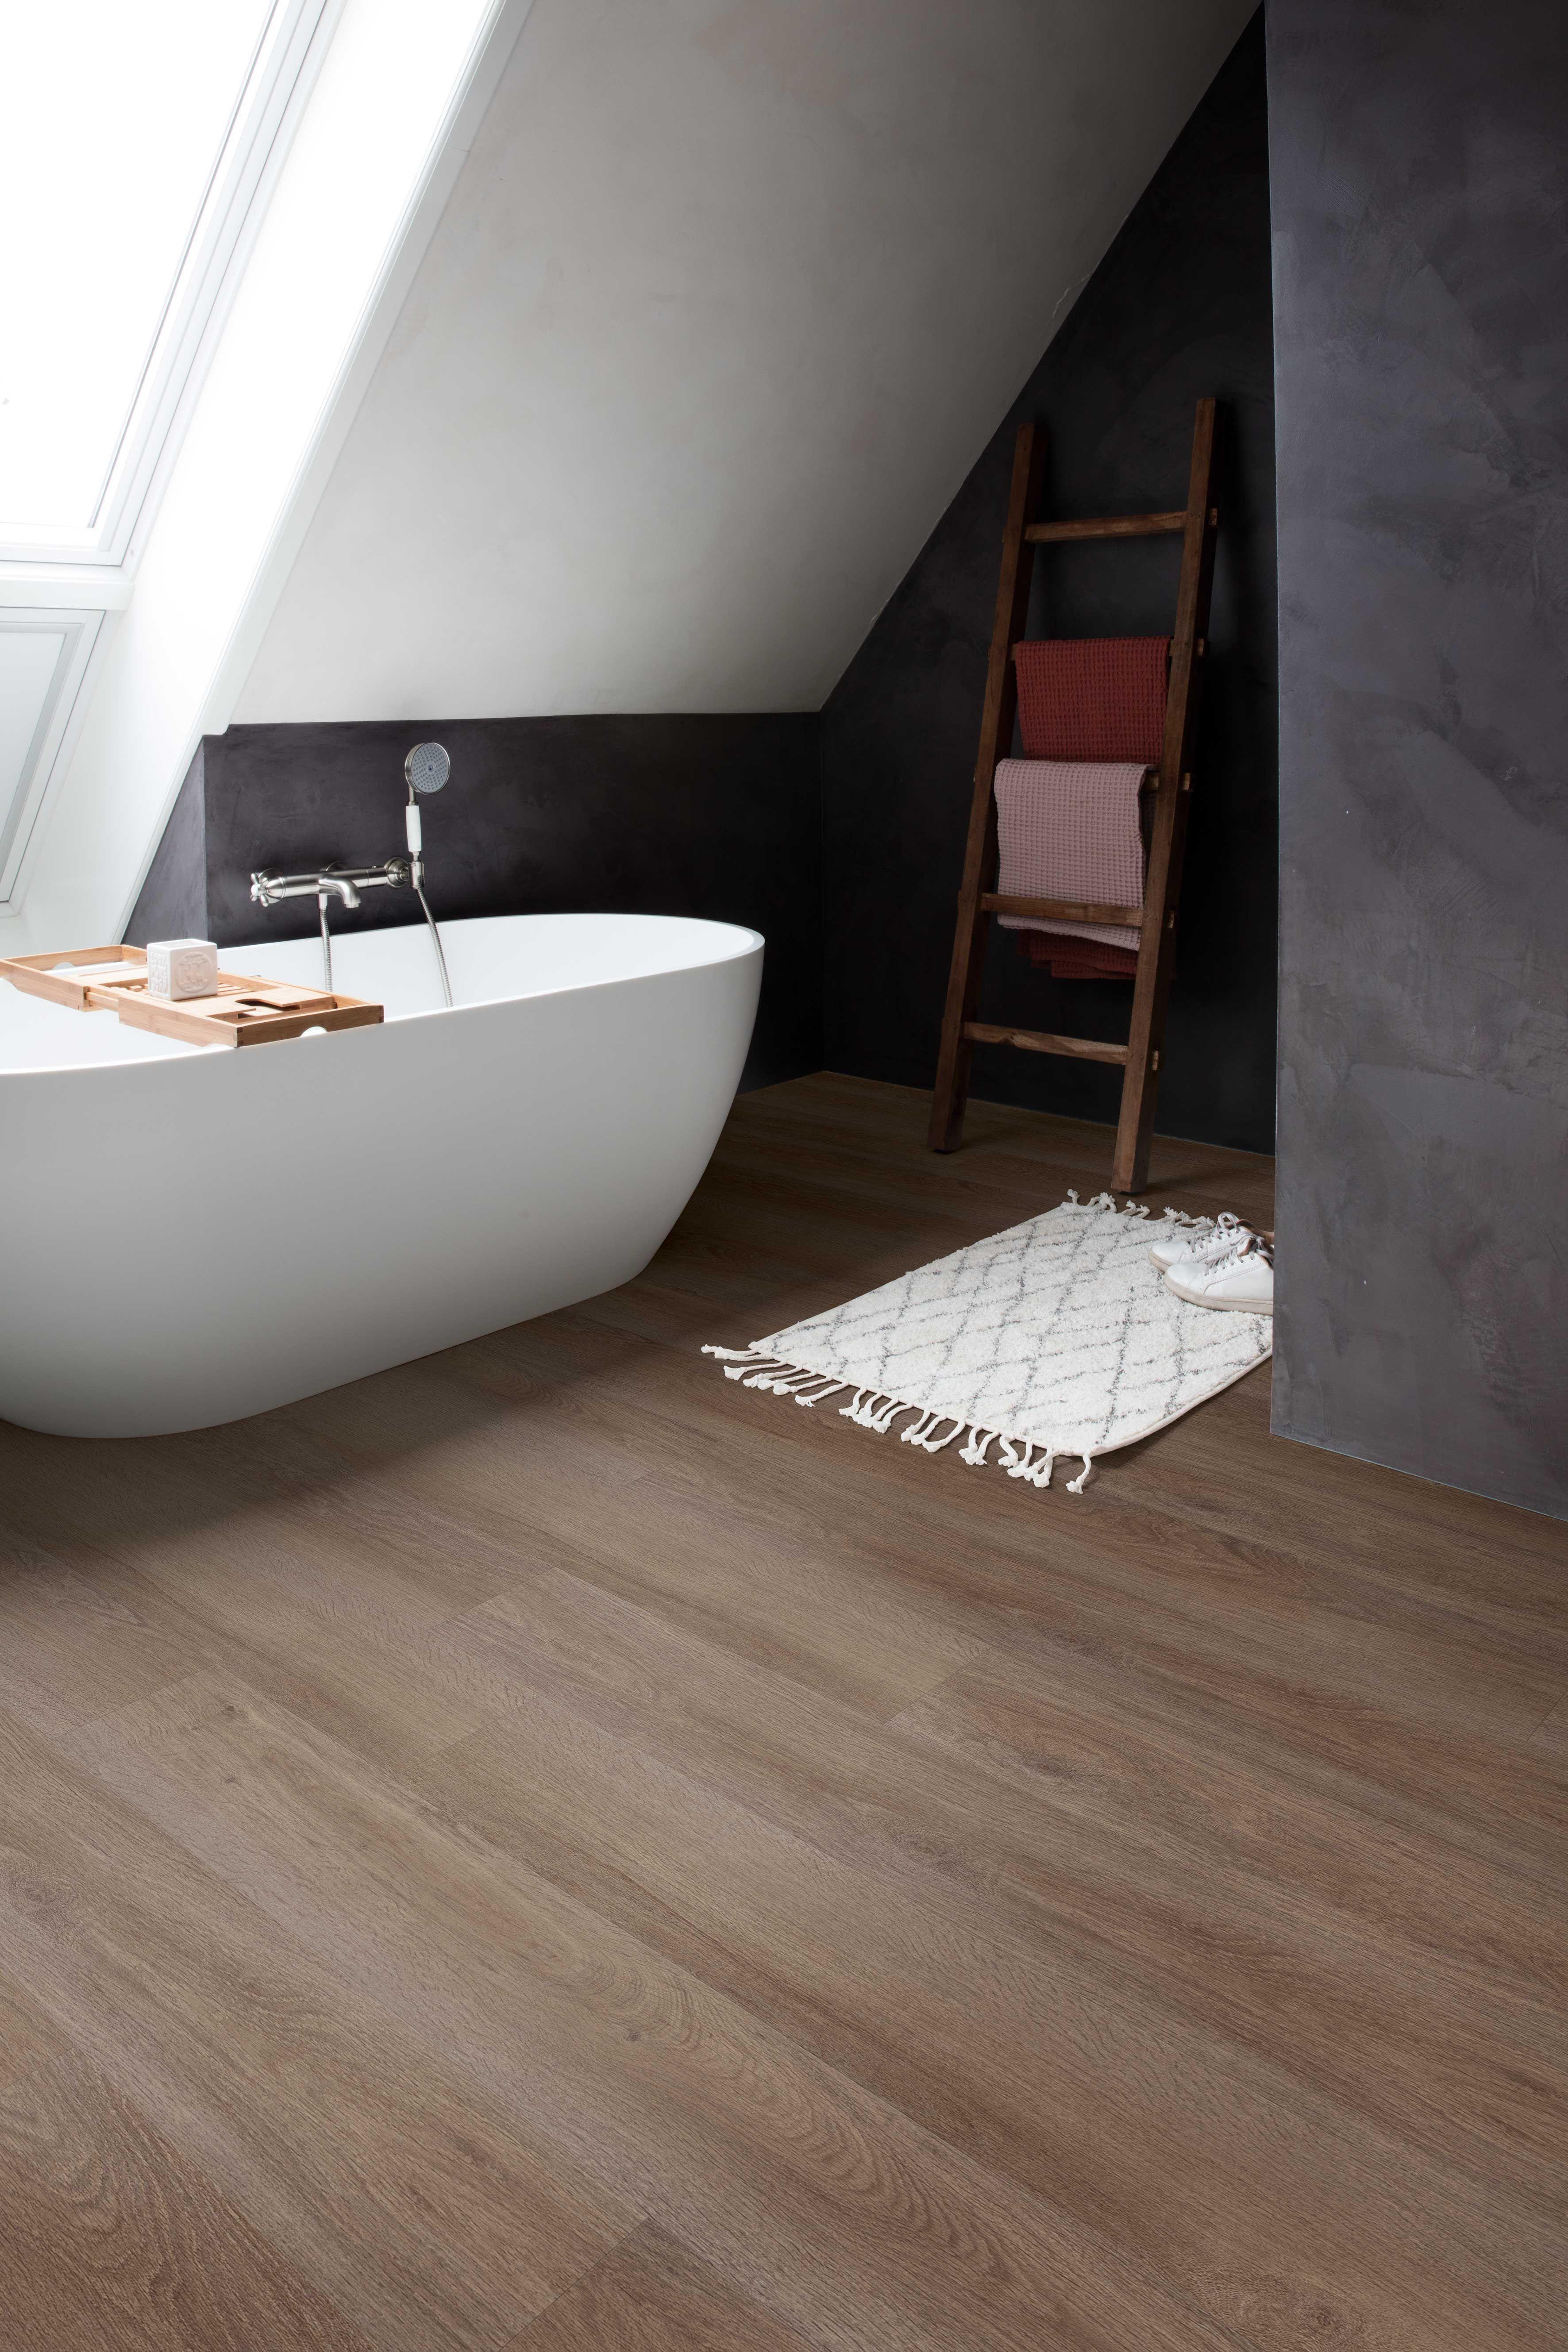 Choose The Perfect Bathroom Floor Vinyl Flooring Bathroom Waterproof Bathroom Flooring Bathroom Flooring